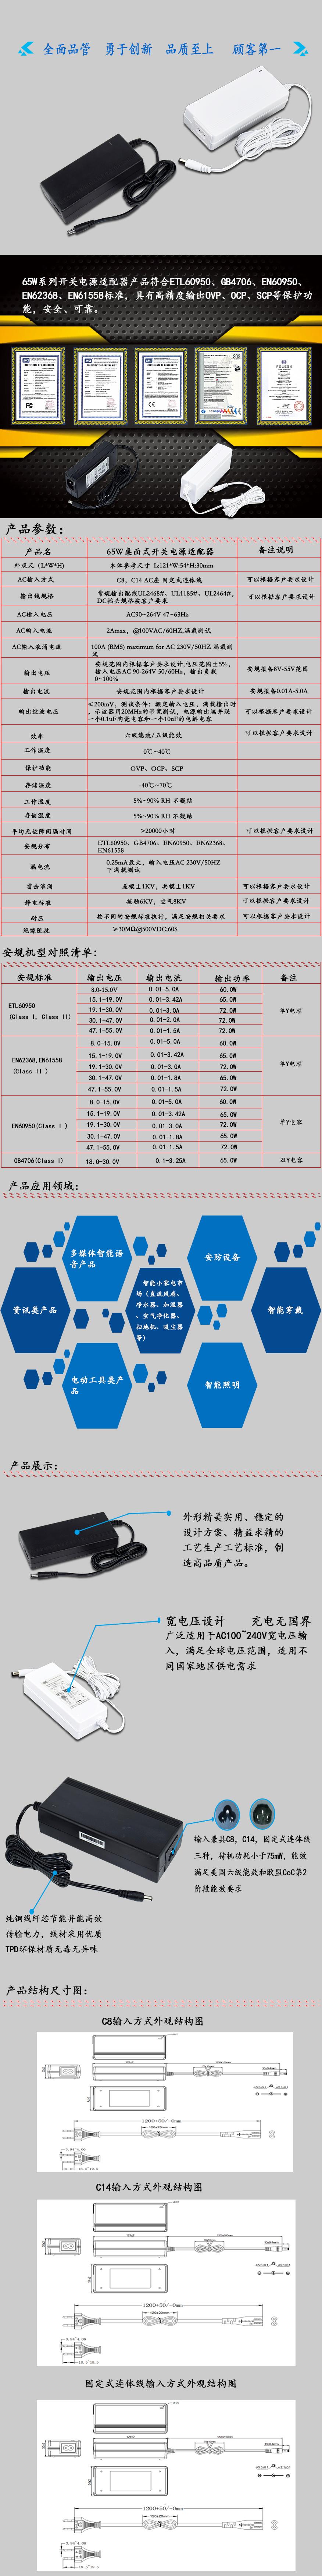 65W中文